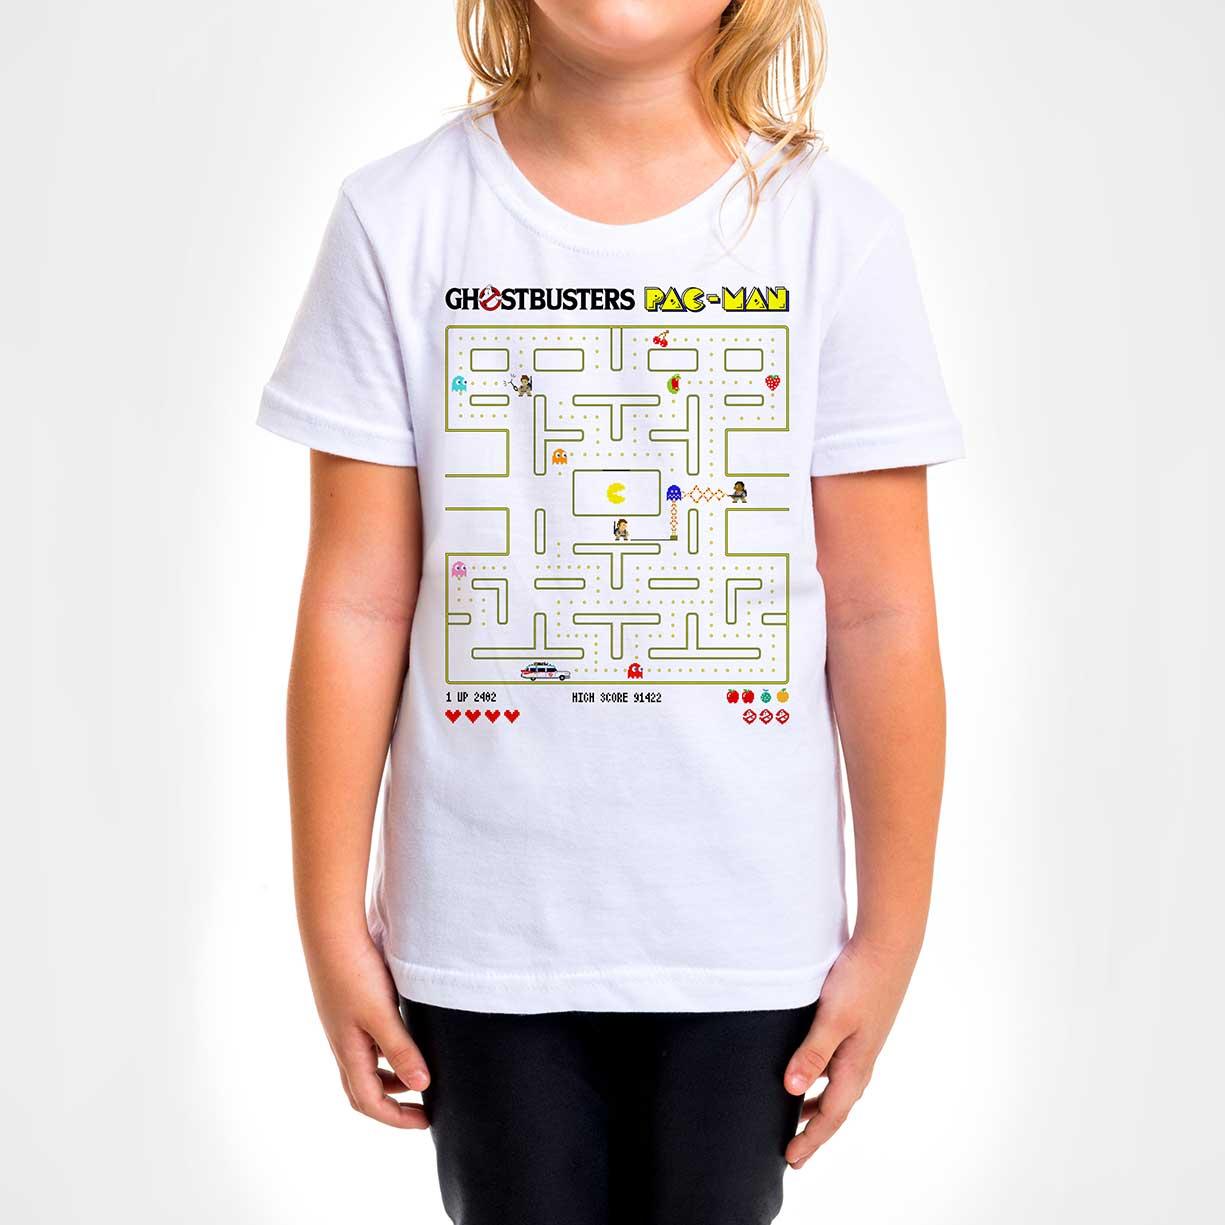 Camisa Infantil - Ghostbuster Pac-Man